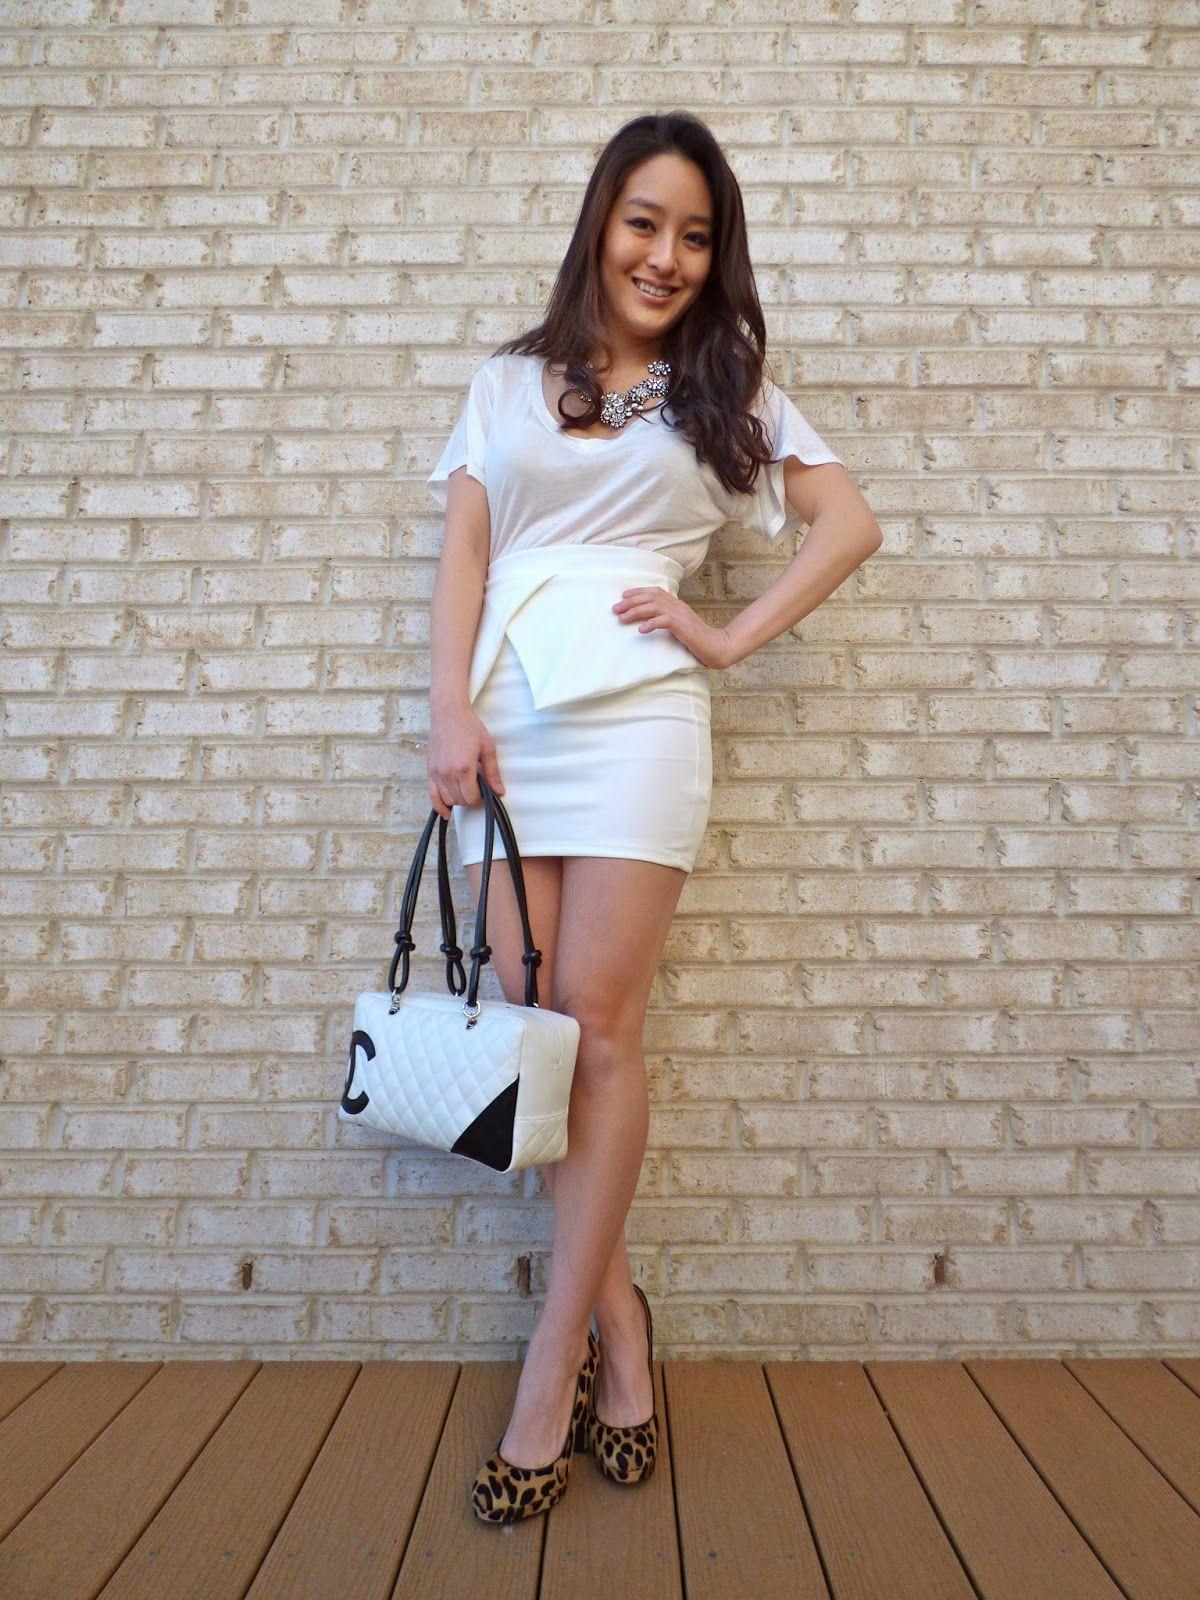 Spotted @Judith Zissman Bruno Stylista sporting a white Charlotte Russe peplum skirt!